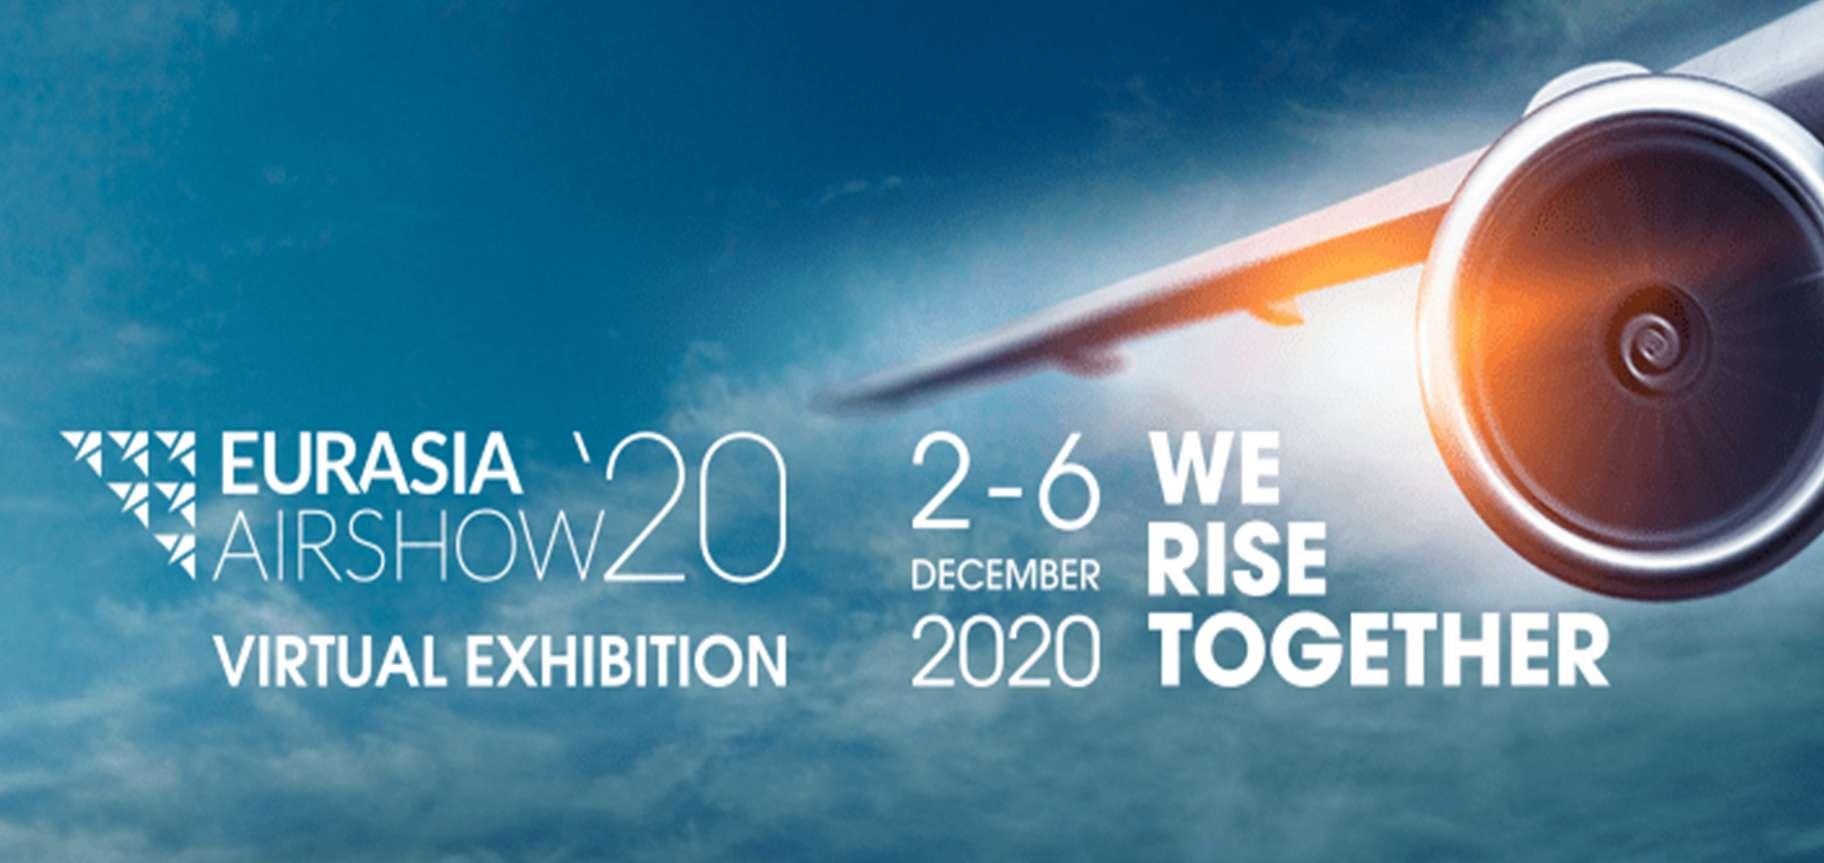 Virtual Eurasia Airshow 2020